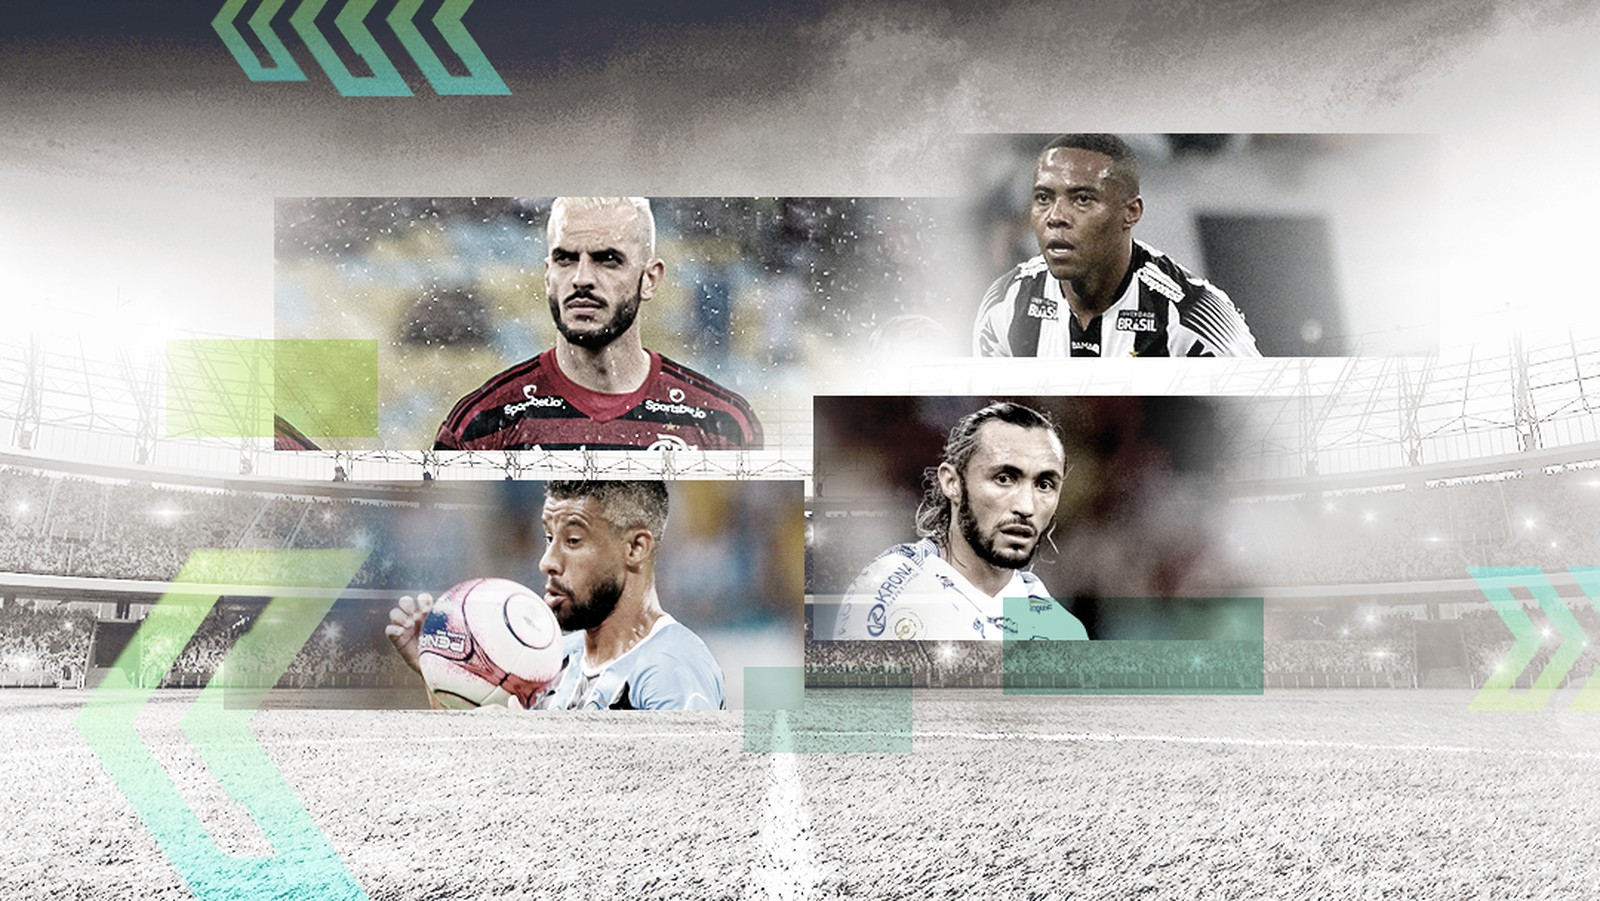 De Léo Moura a Elias: Central lista jogadores livres no mercado